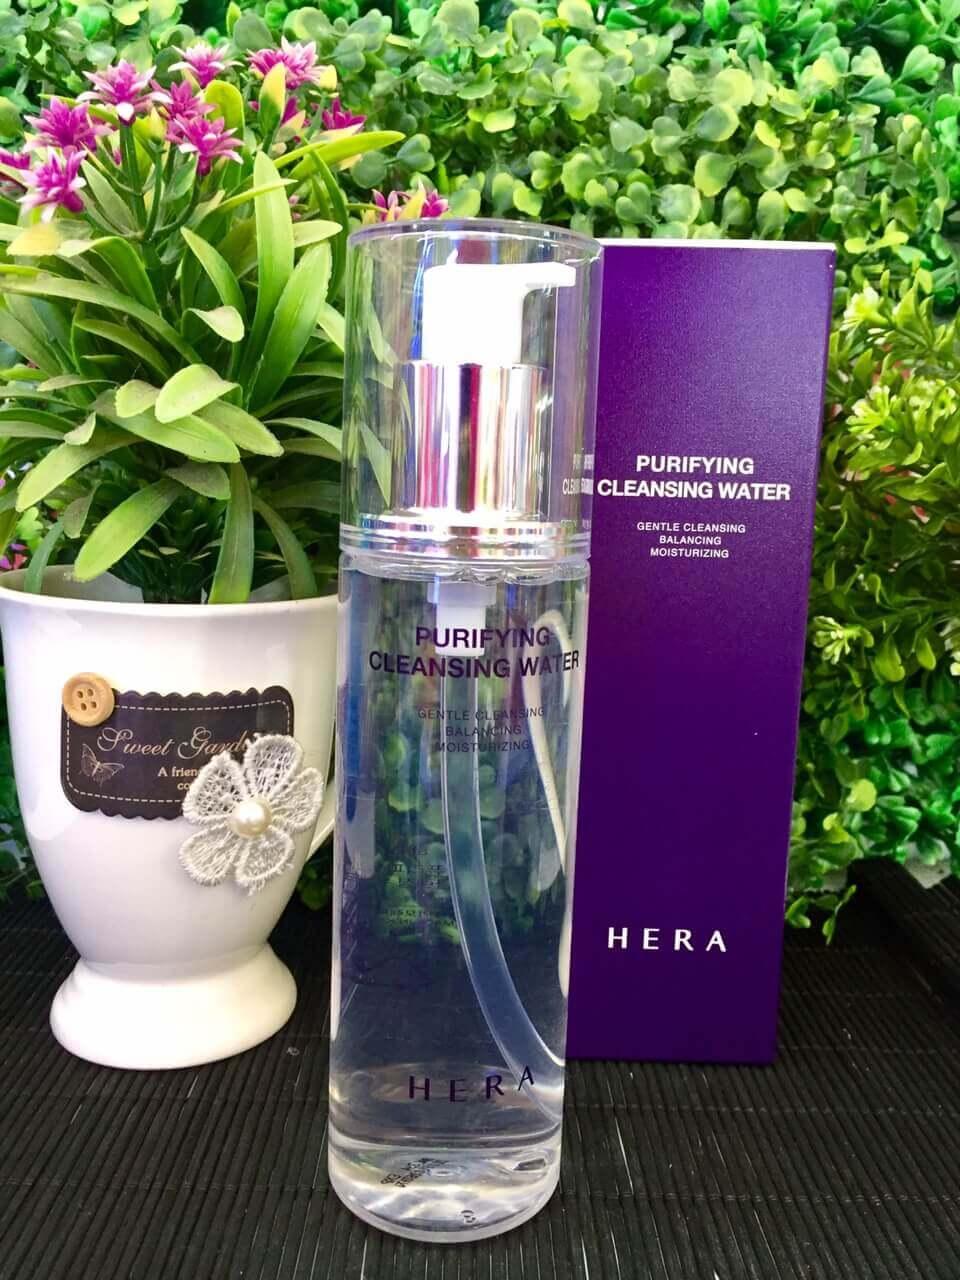 nuoc-tay-trang-hera-skincare-purifying-cleansing-water-04